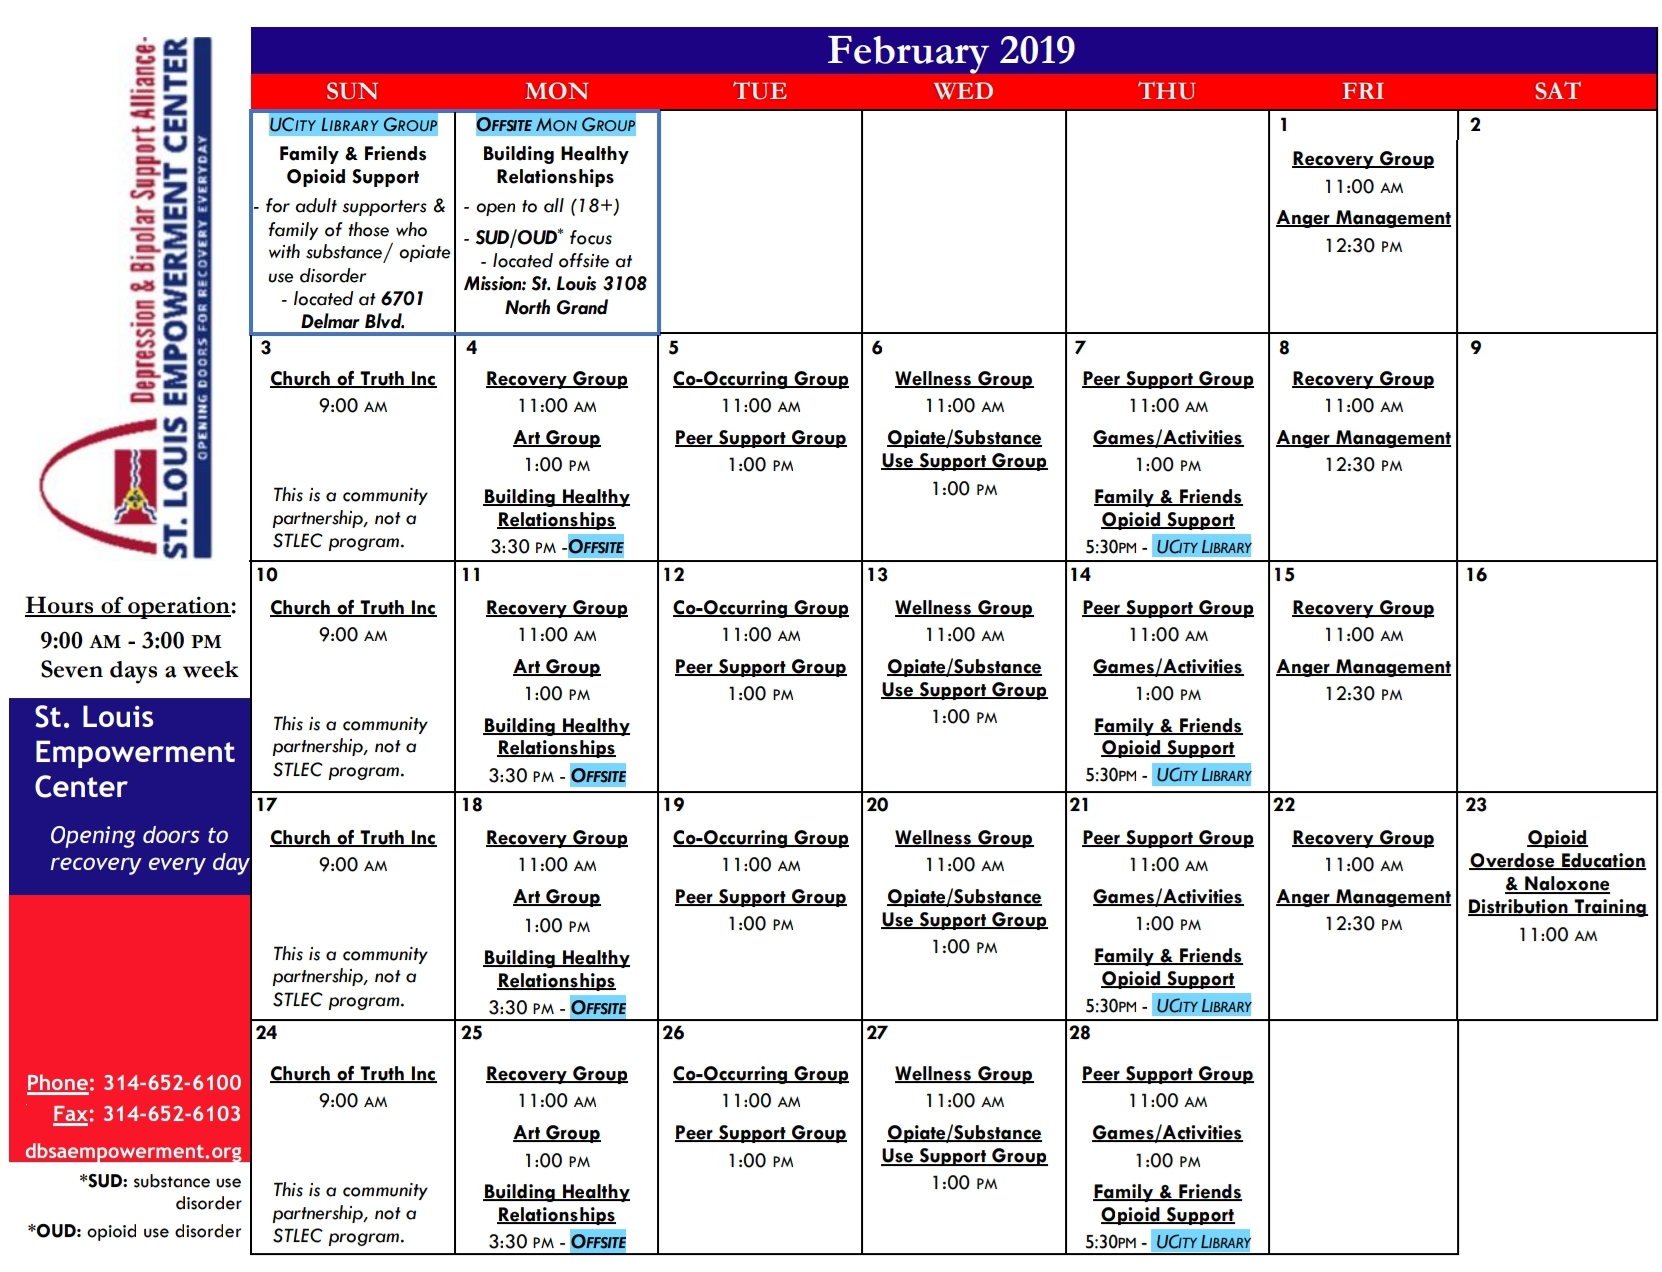 Rcc Calendar 2019 STLEC RCC Calendar   FEB 2019 v2